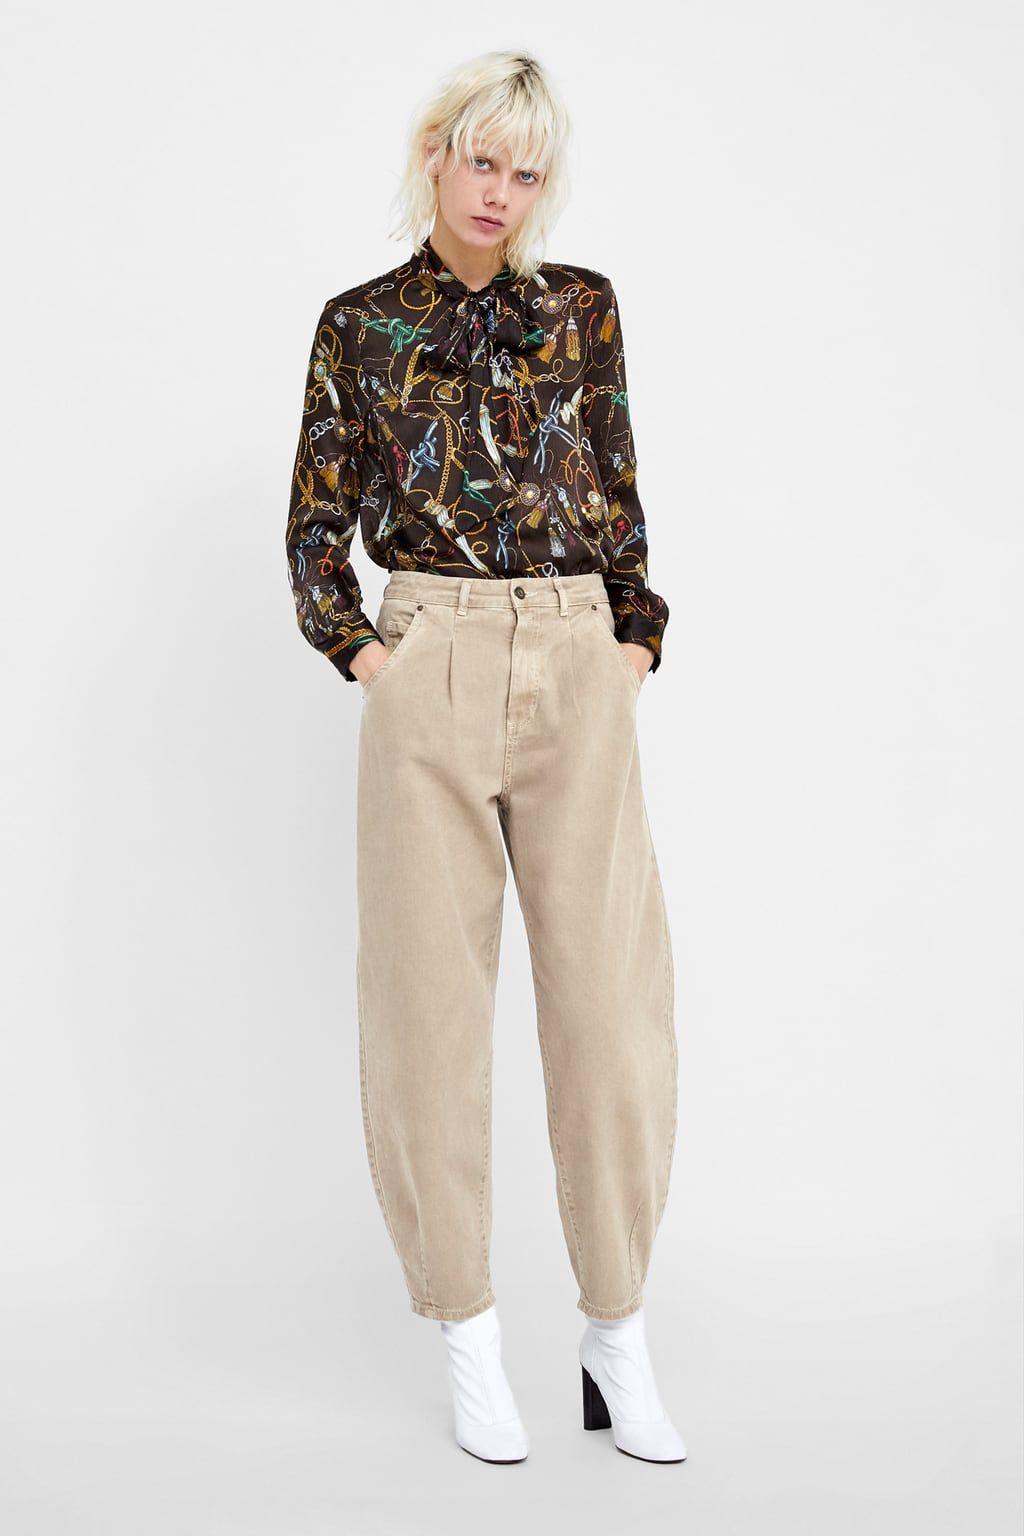 Lookbook dress zara pantalon femme 2019, fashion model, t shirt